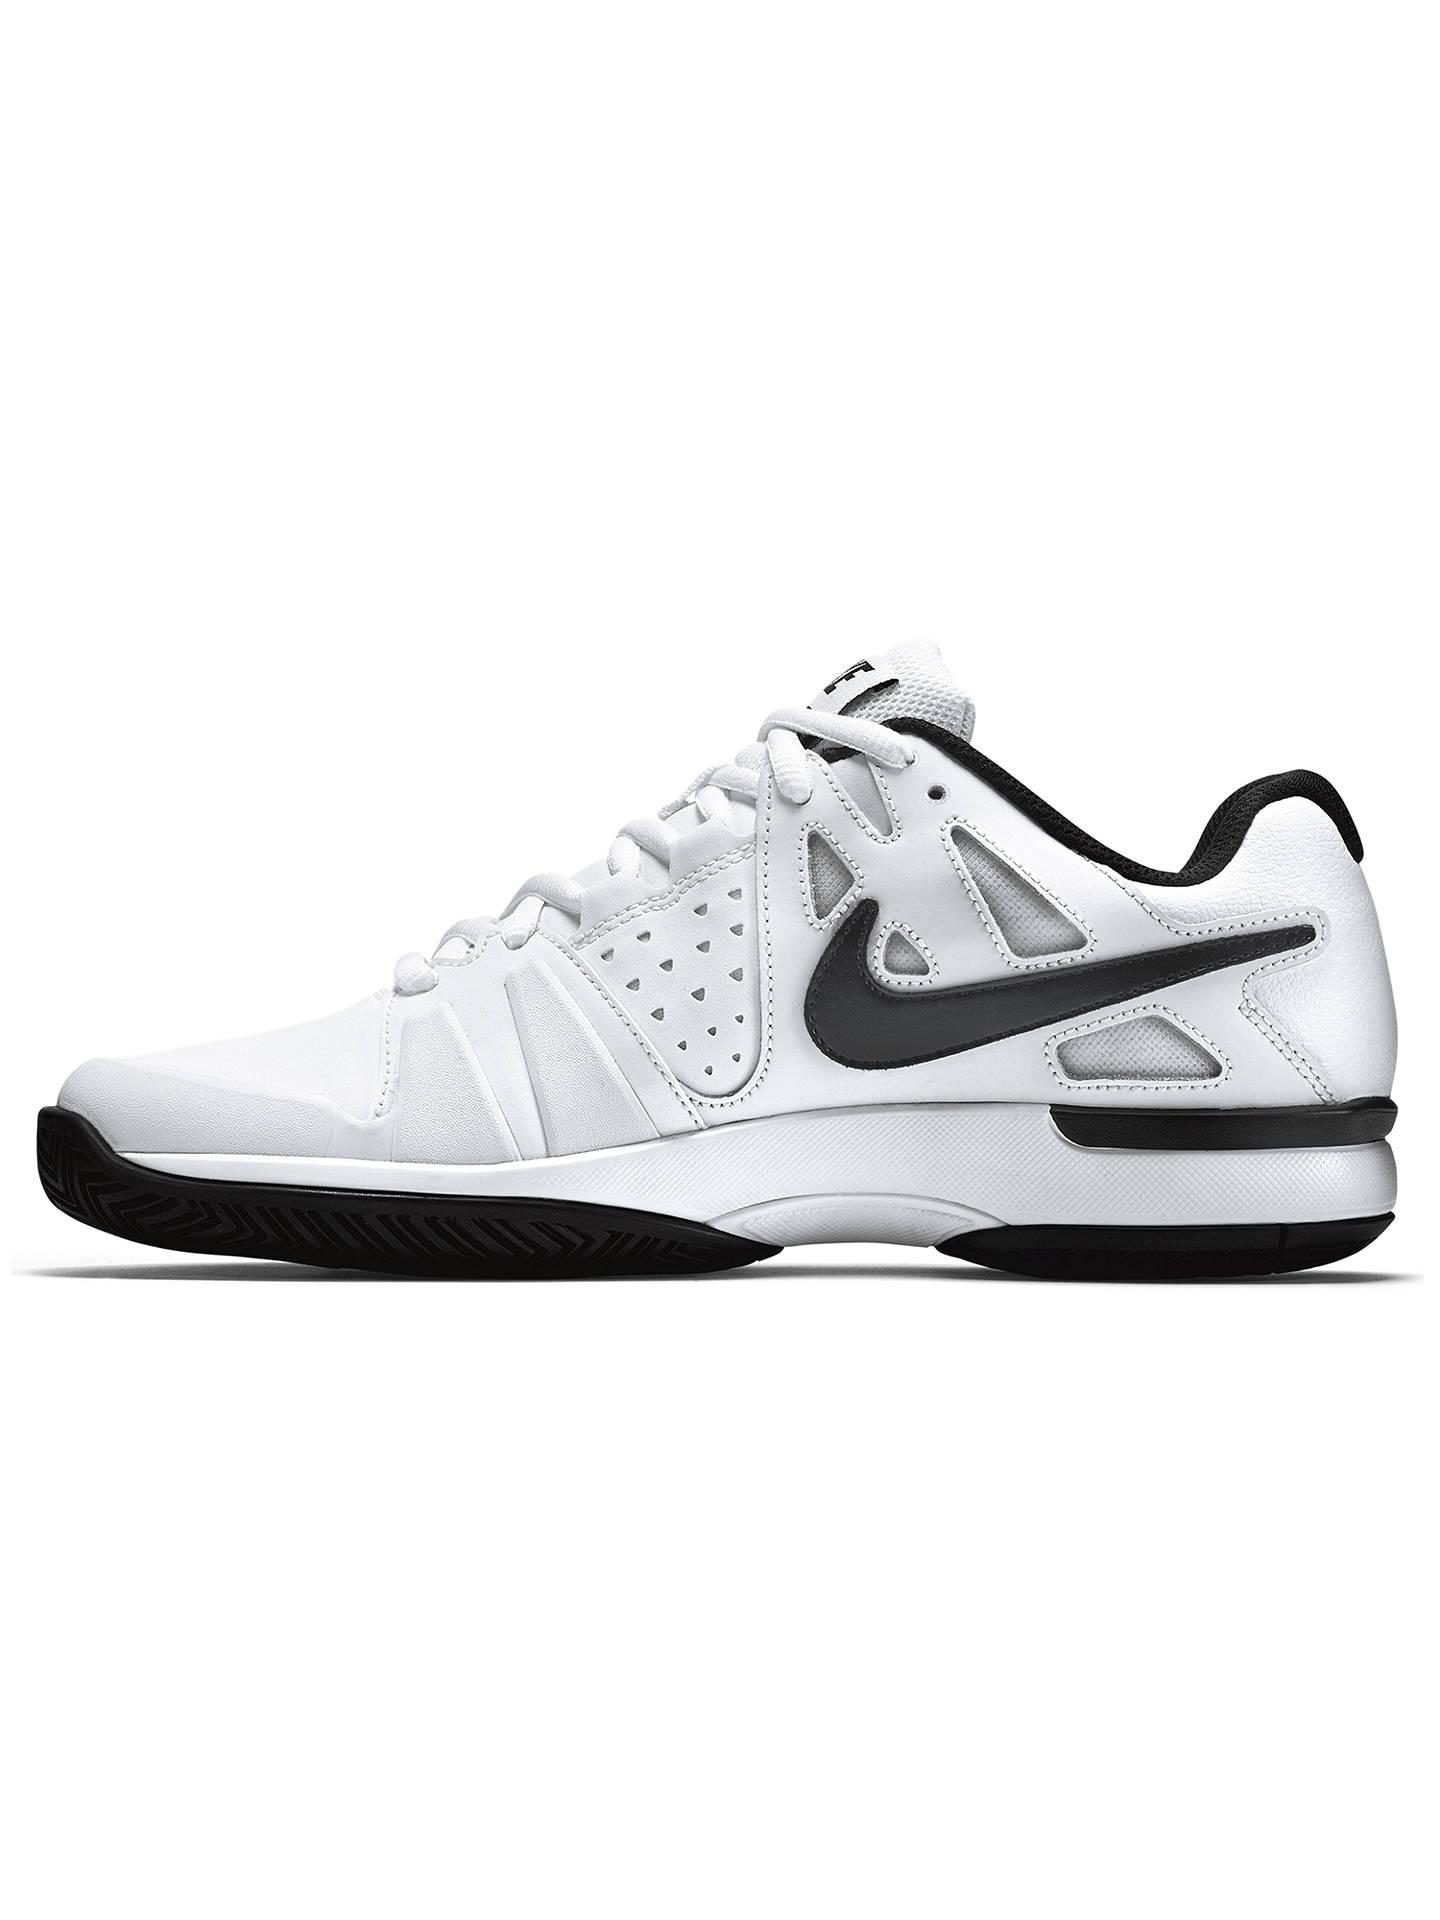 4e075342ad2e ... Buy Nike Air Vapor Advantage Leather Men's Tennis Shoes, White/Black, 7  Online